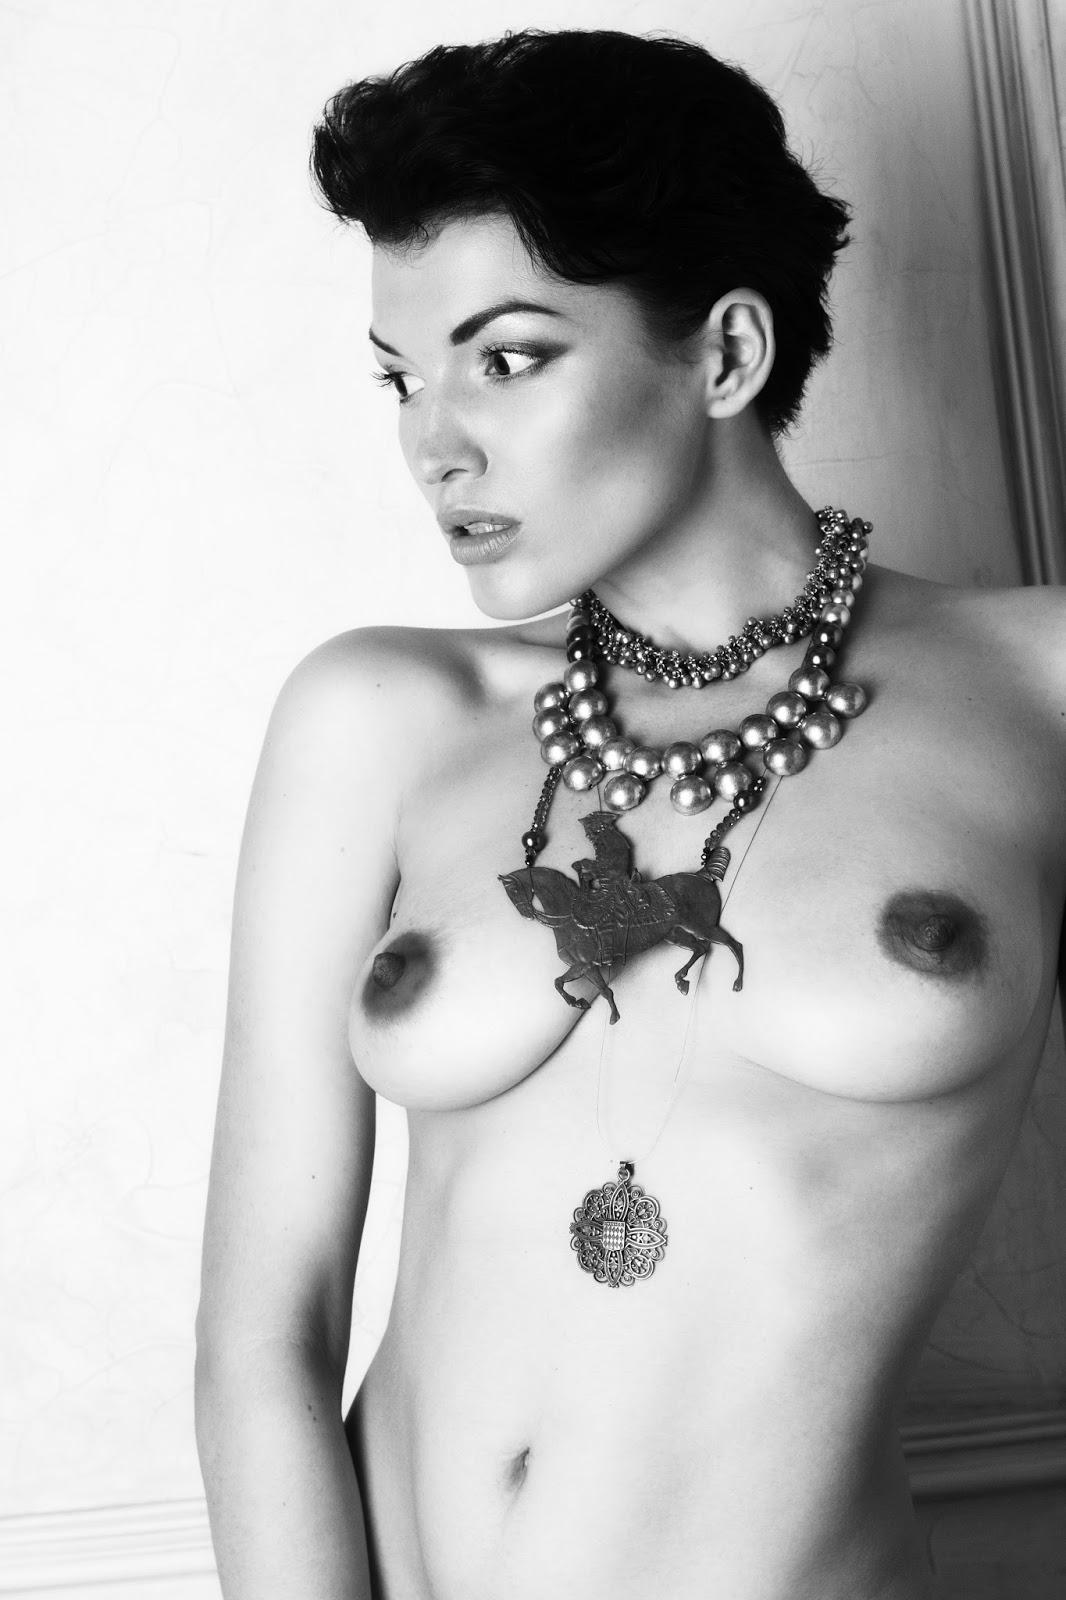 Aliona Nude nude photoshootfashion photographer. impression.